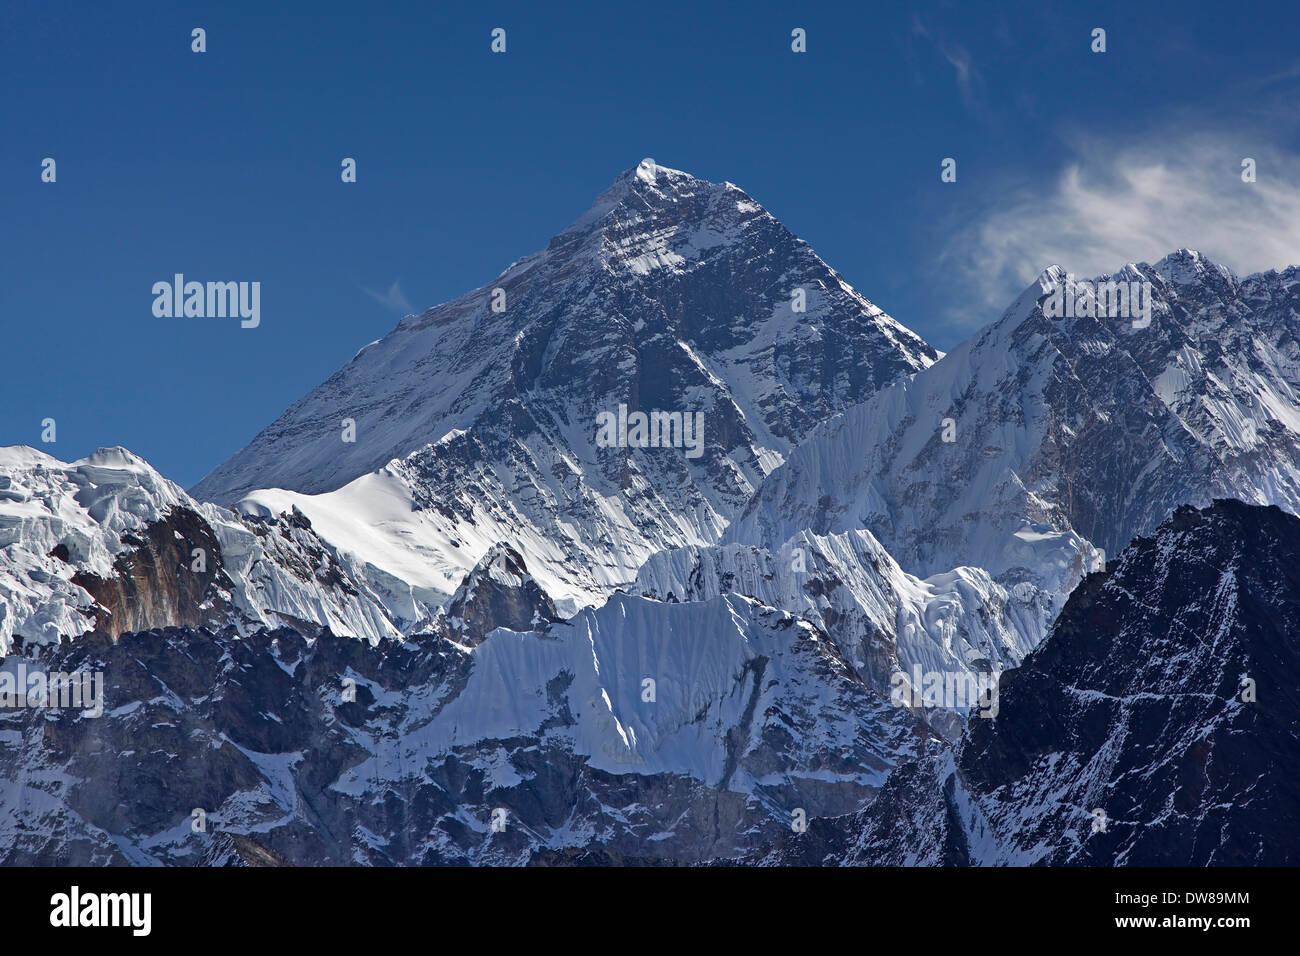 Mount Everest. - Stock Image